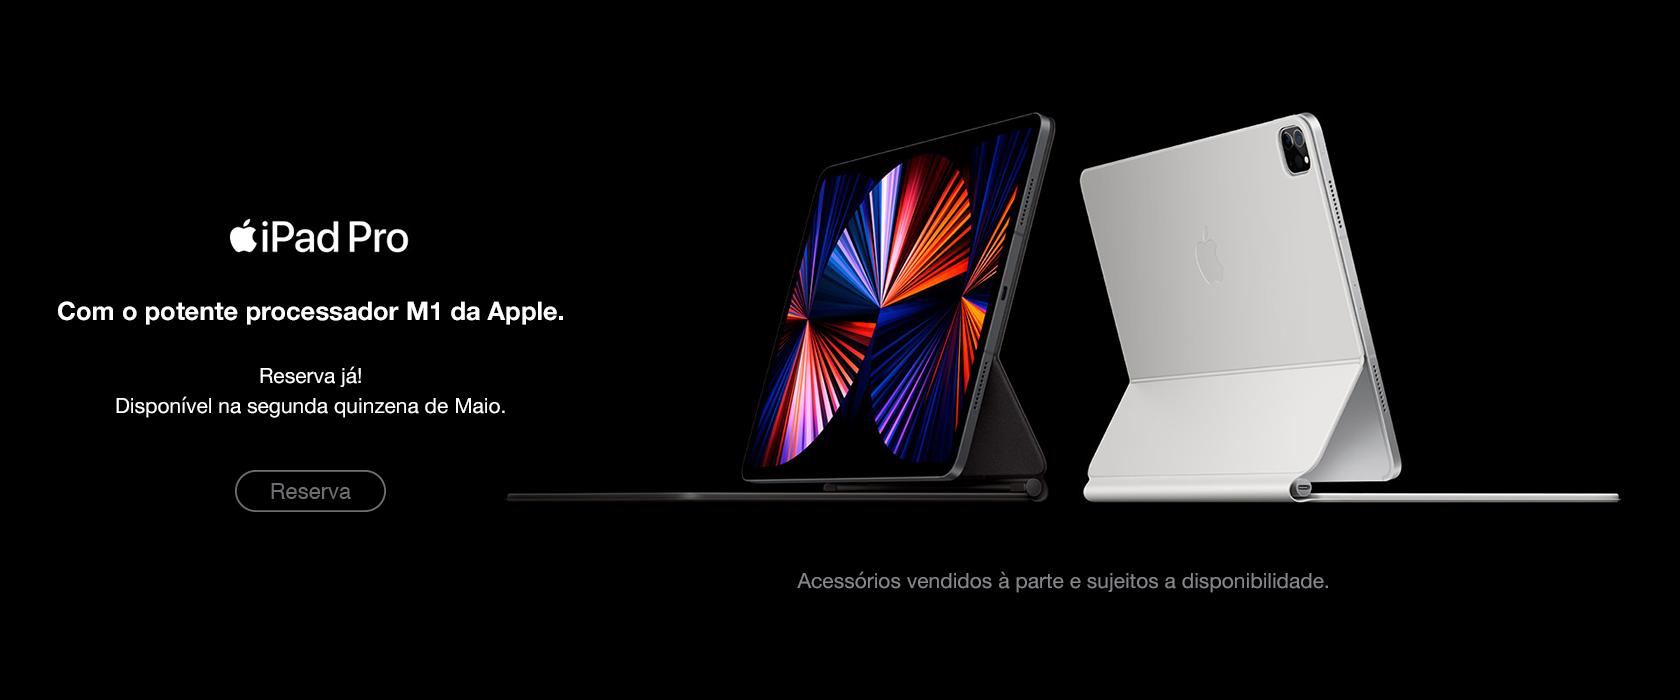 Homepage Slideshow - iPad Pro - reserva 2021